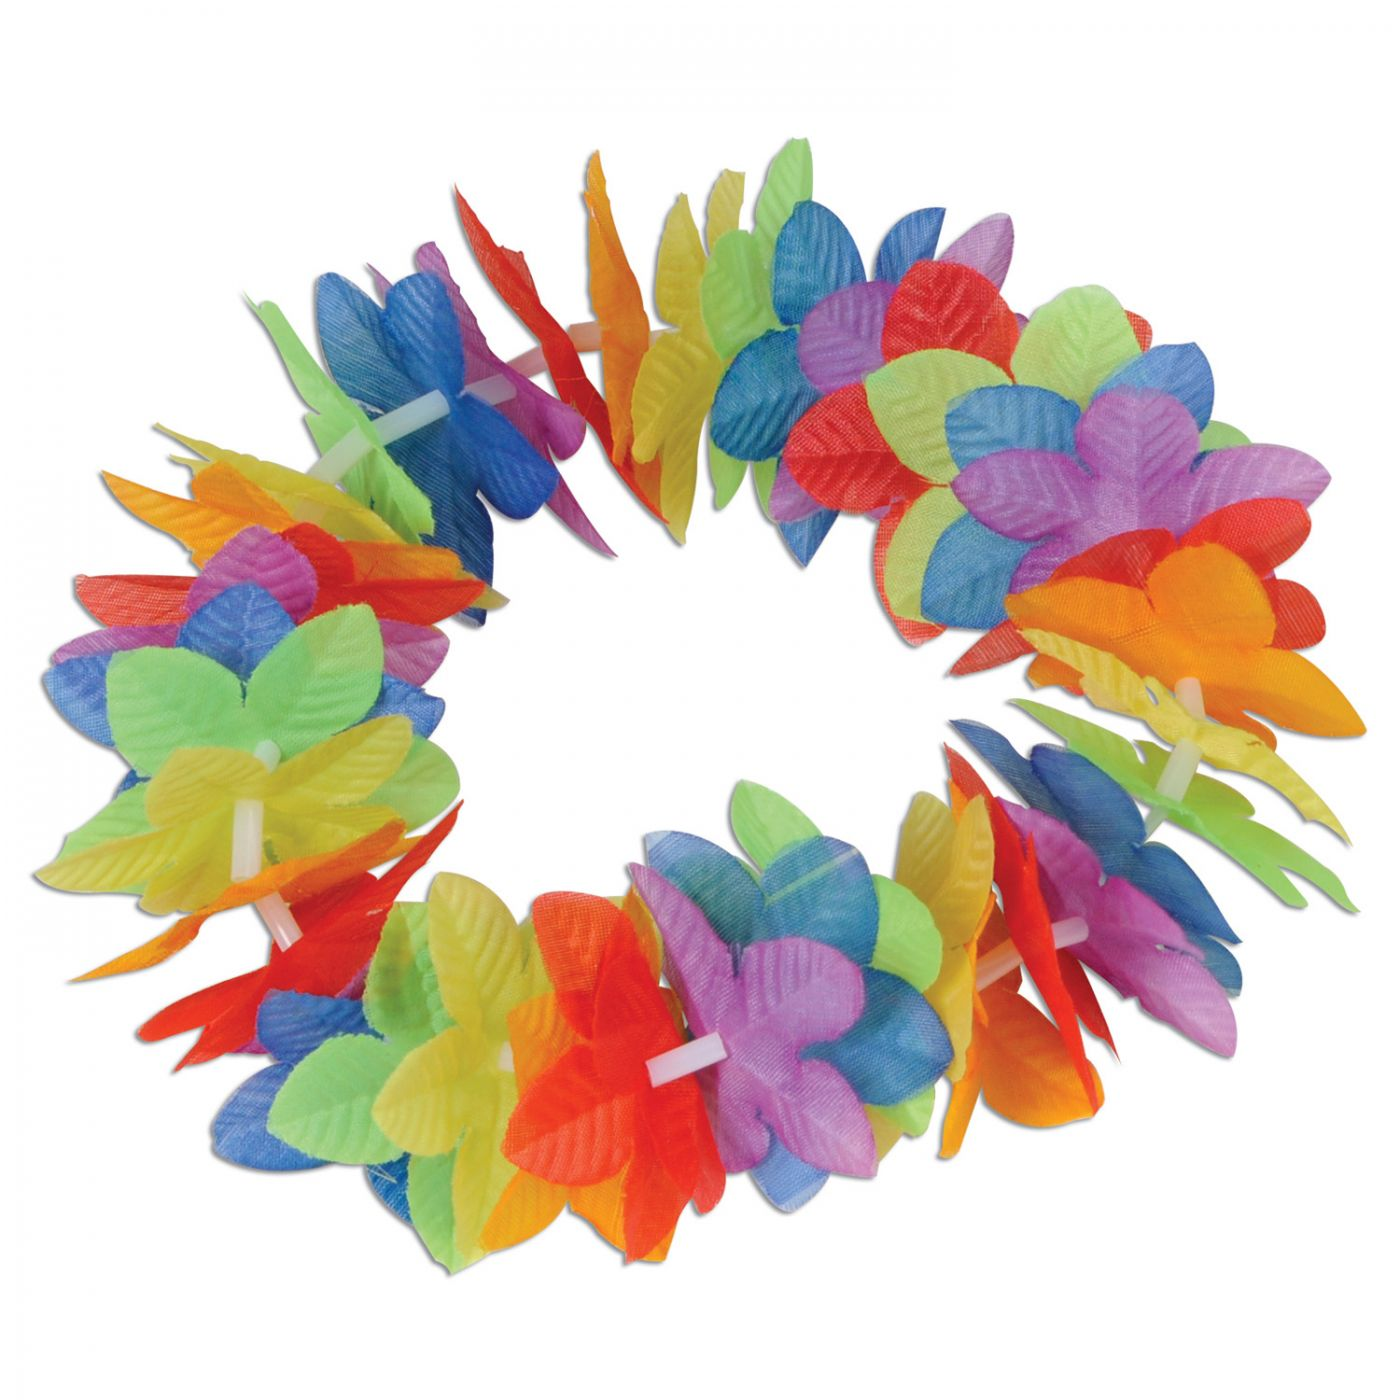 Silk 'N Petals Rainbow Floral Headband image